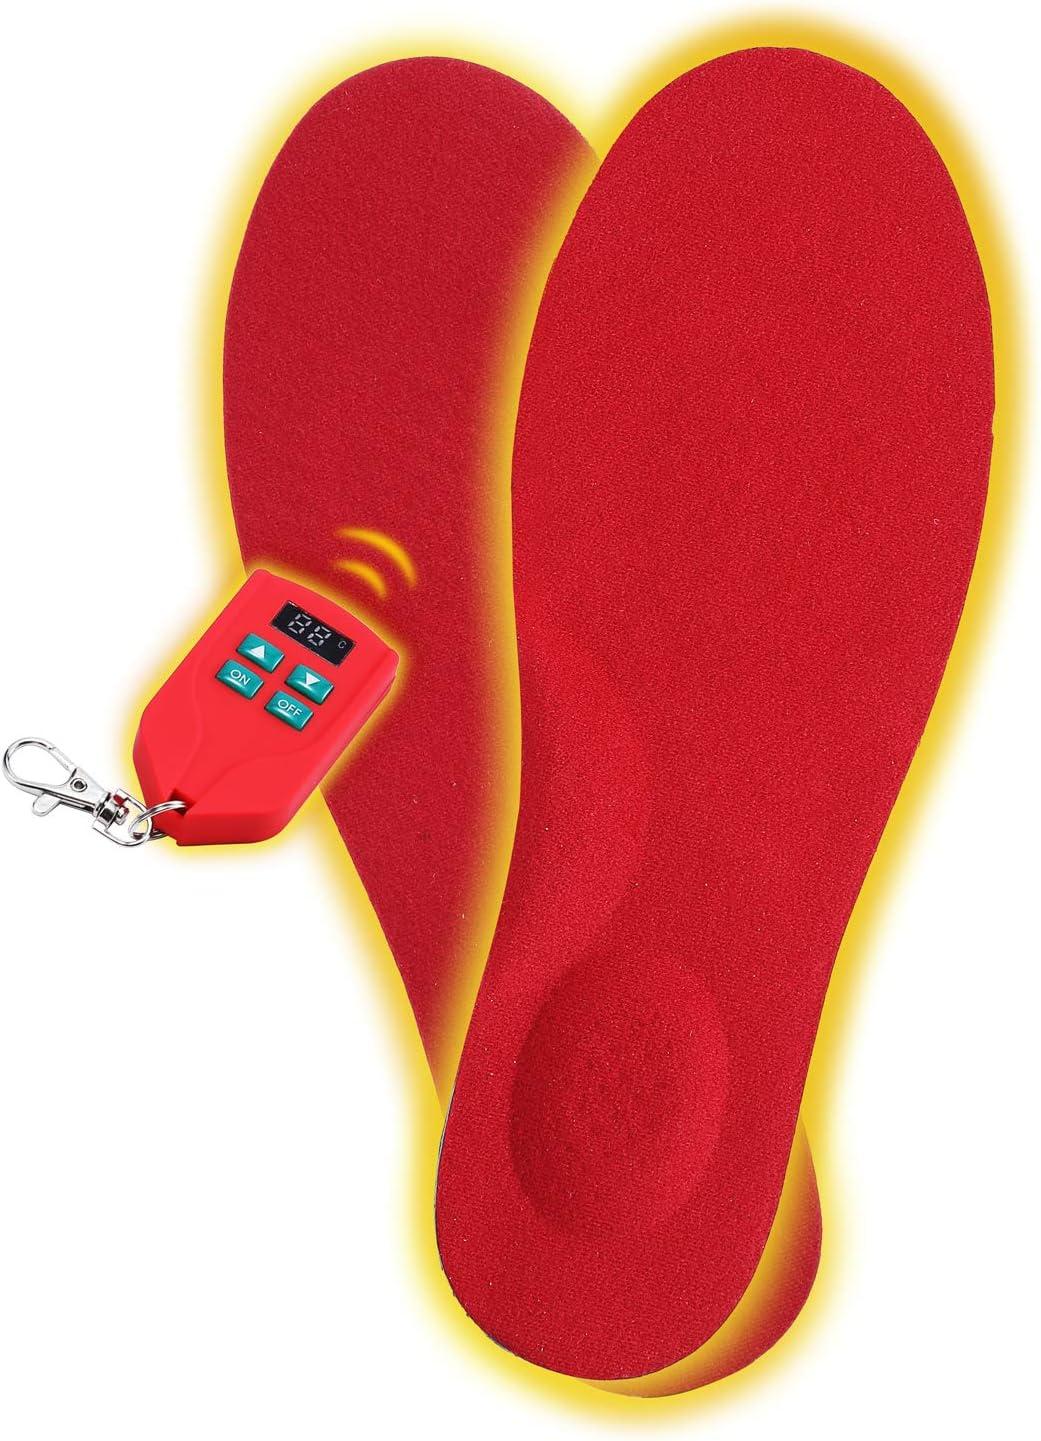 Winna Heated Shoe Inserts: